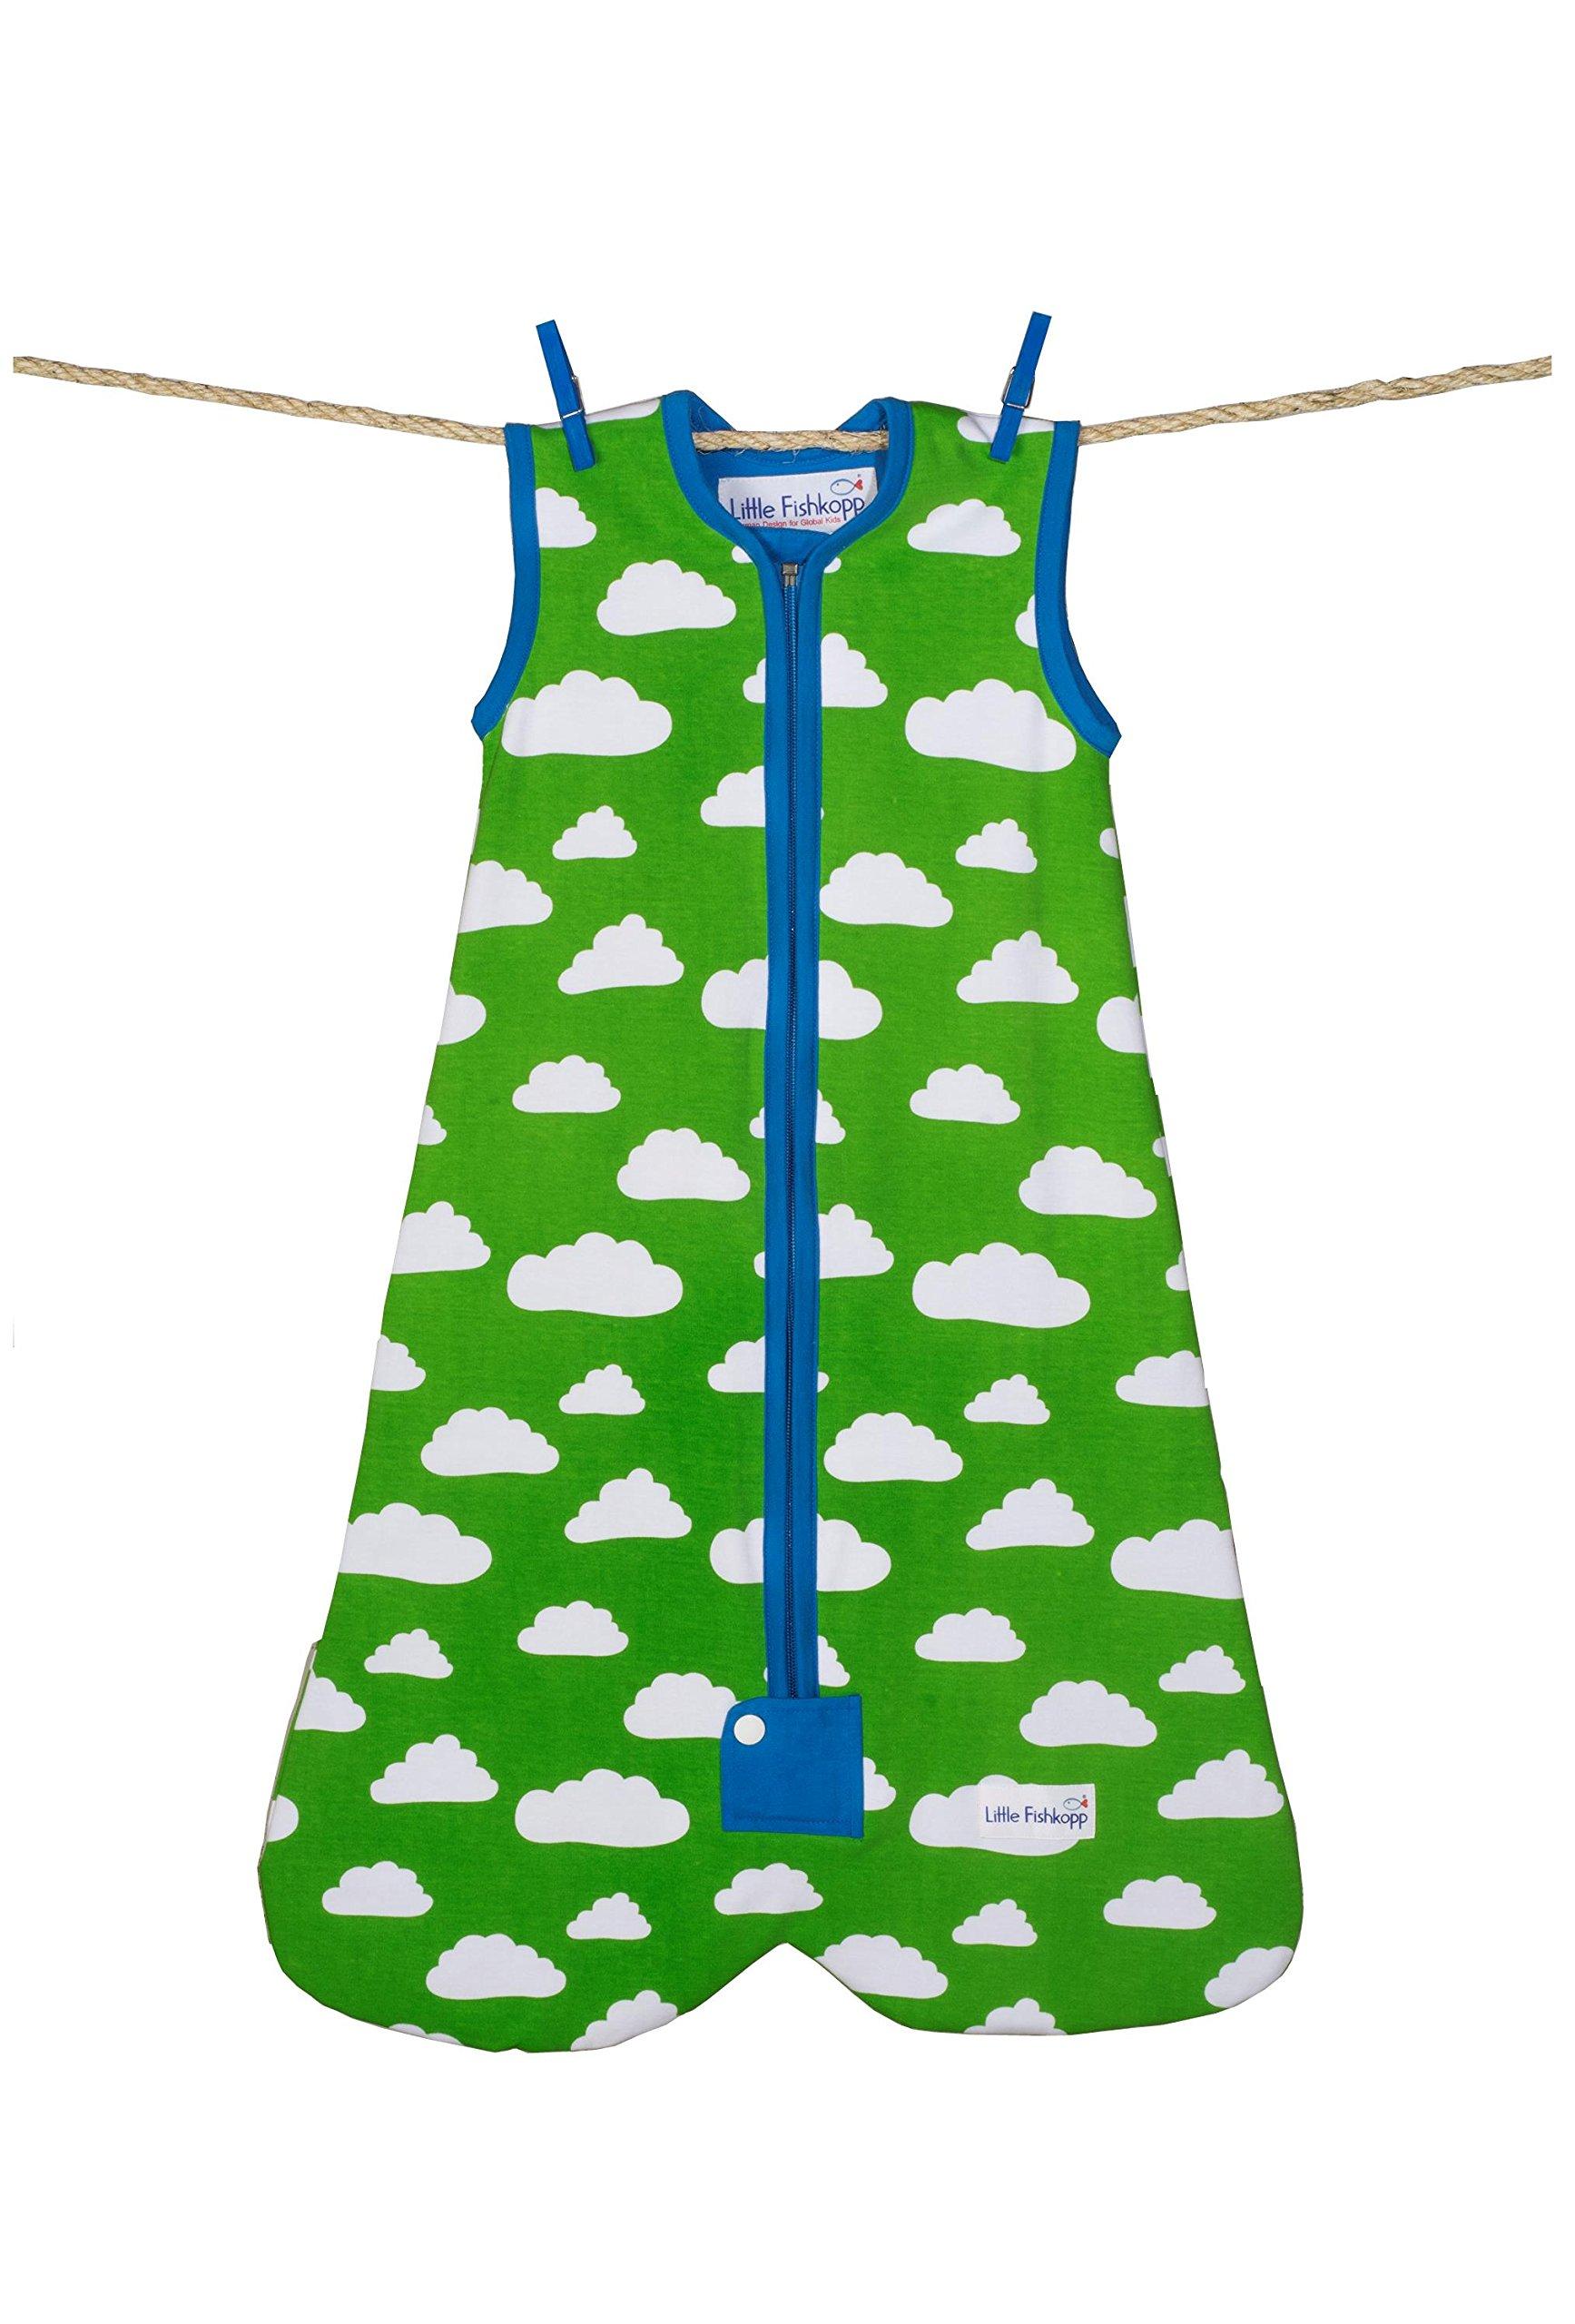 Little Fishkopp Organic Cotton Baby Sleep Bag, Clouds, 1.0 Tog, Green, Large